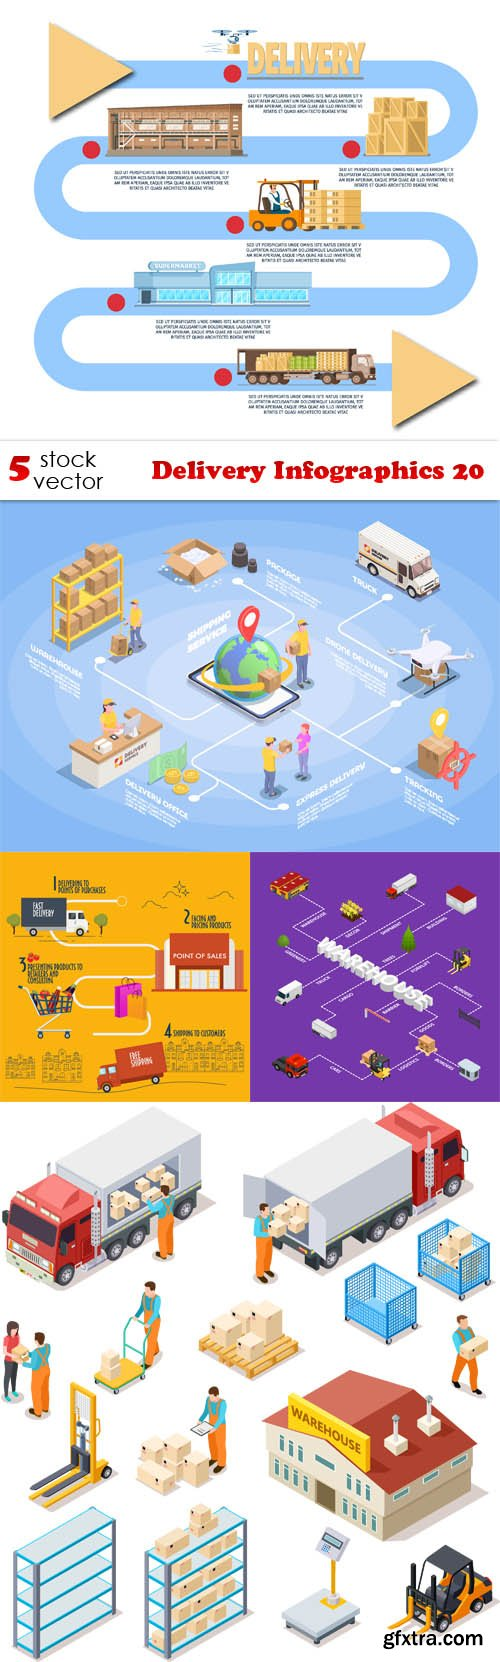 Vectors - Delivery Infographics 20